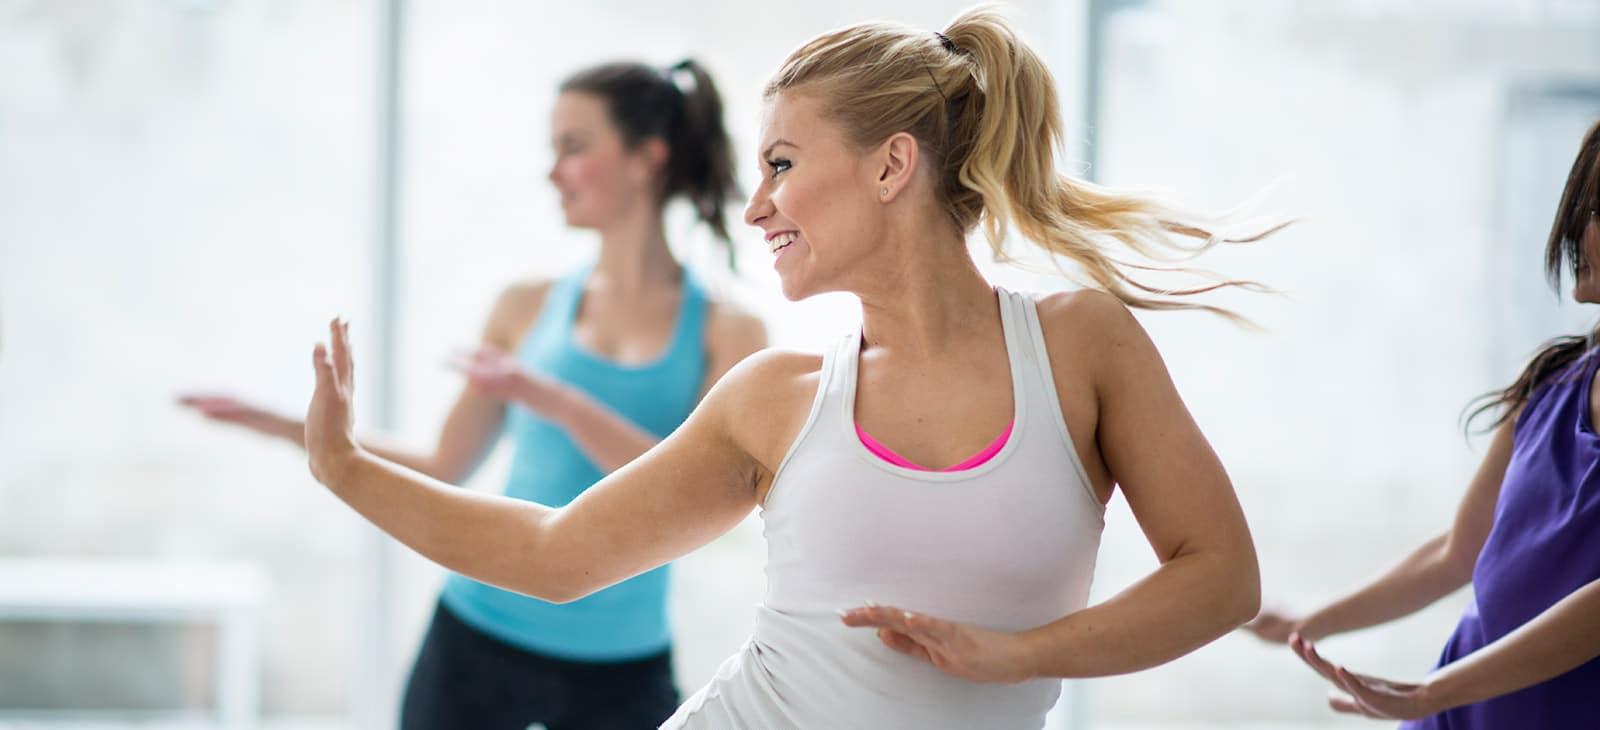 Zumba tanzen, lachen unter Frauen